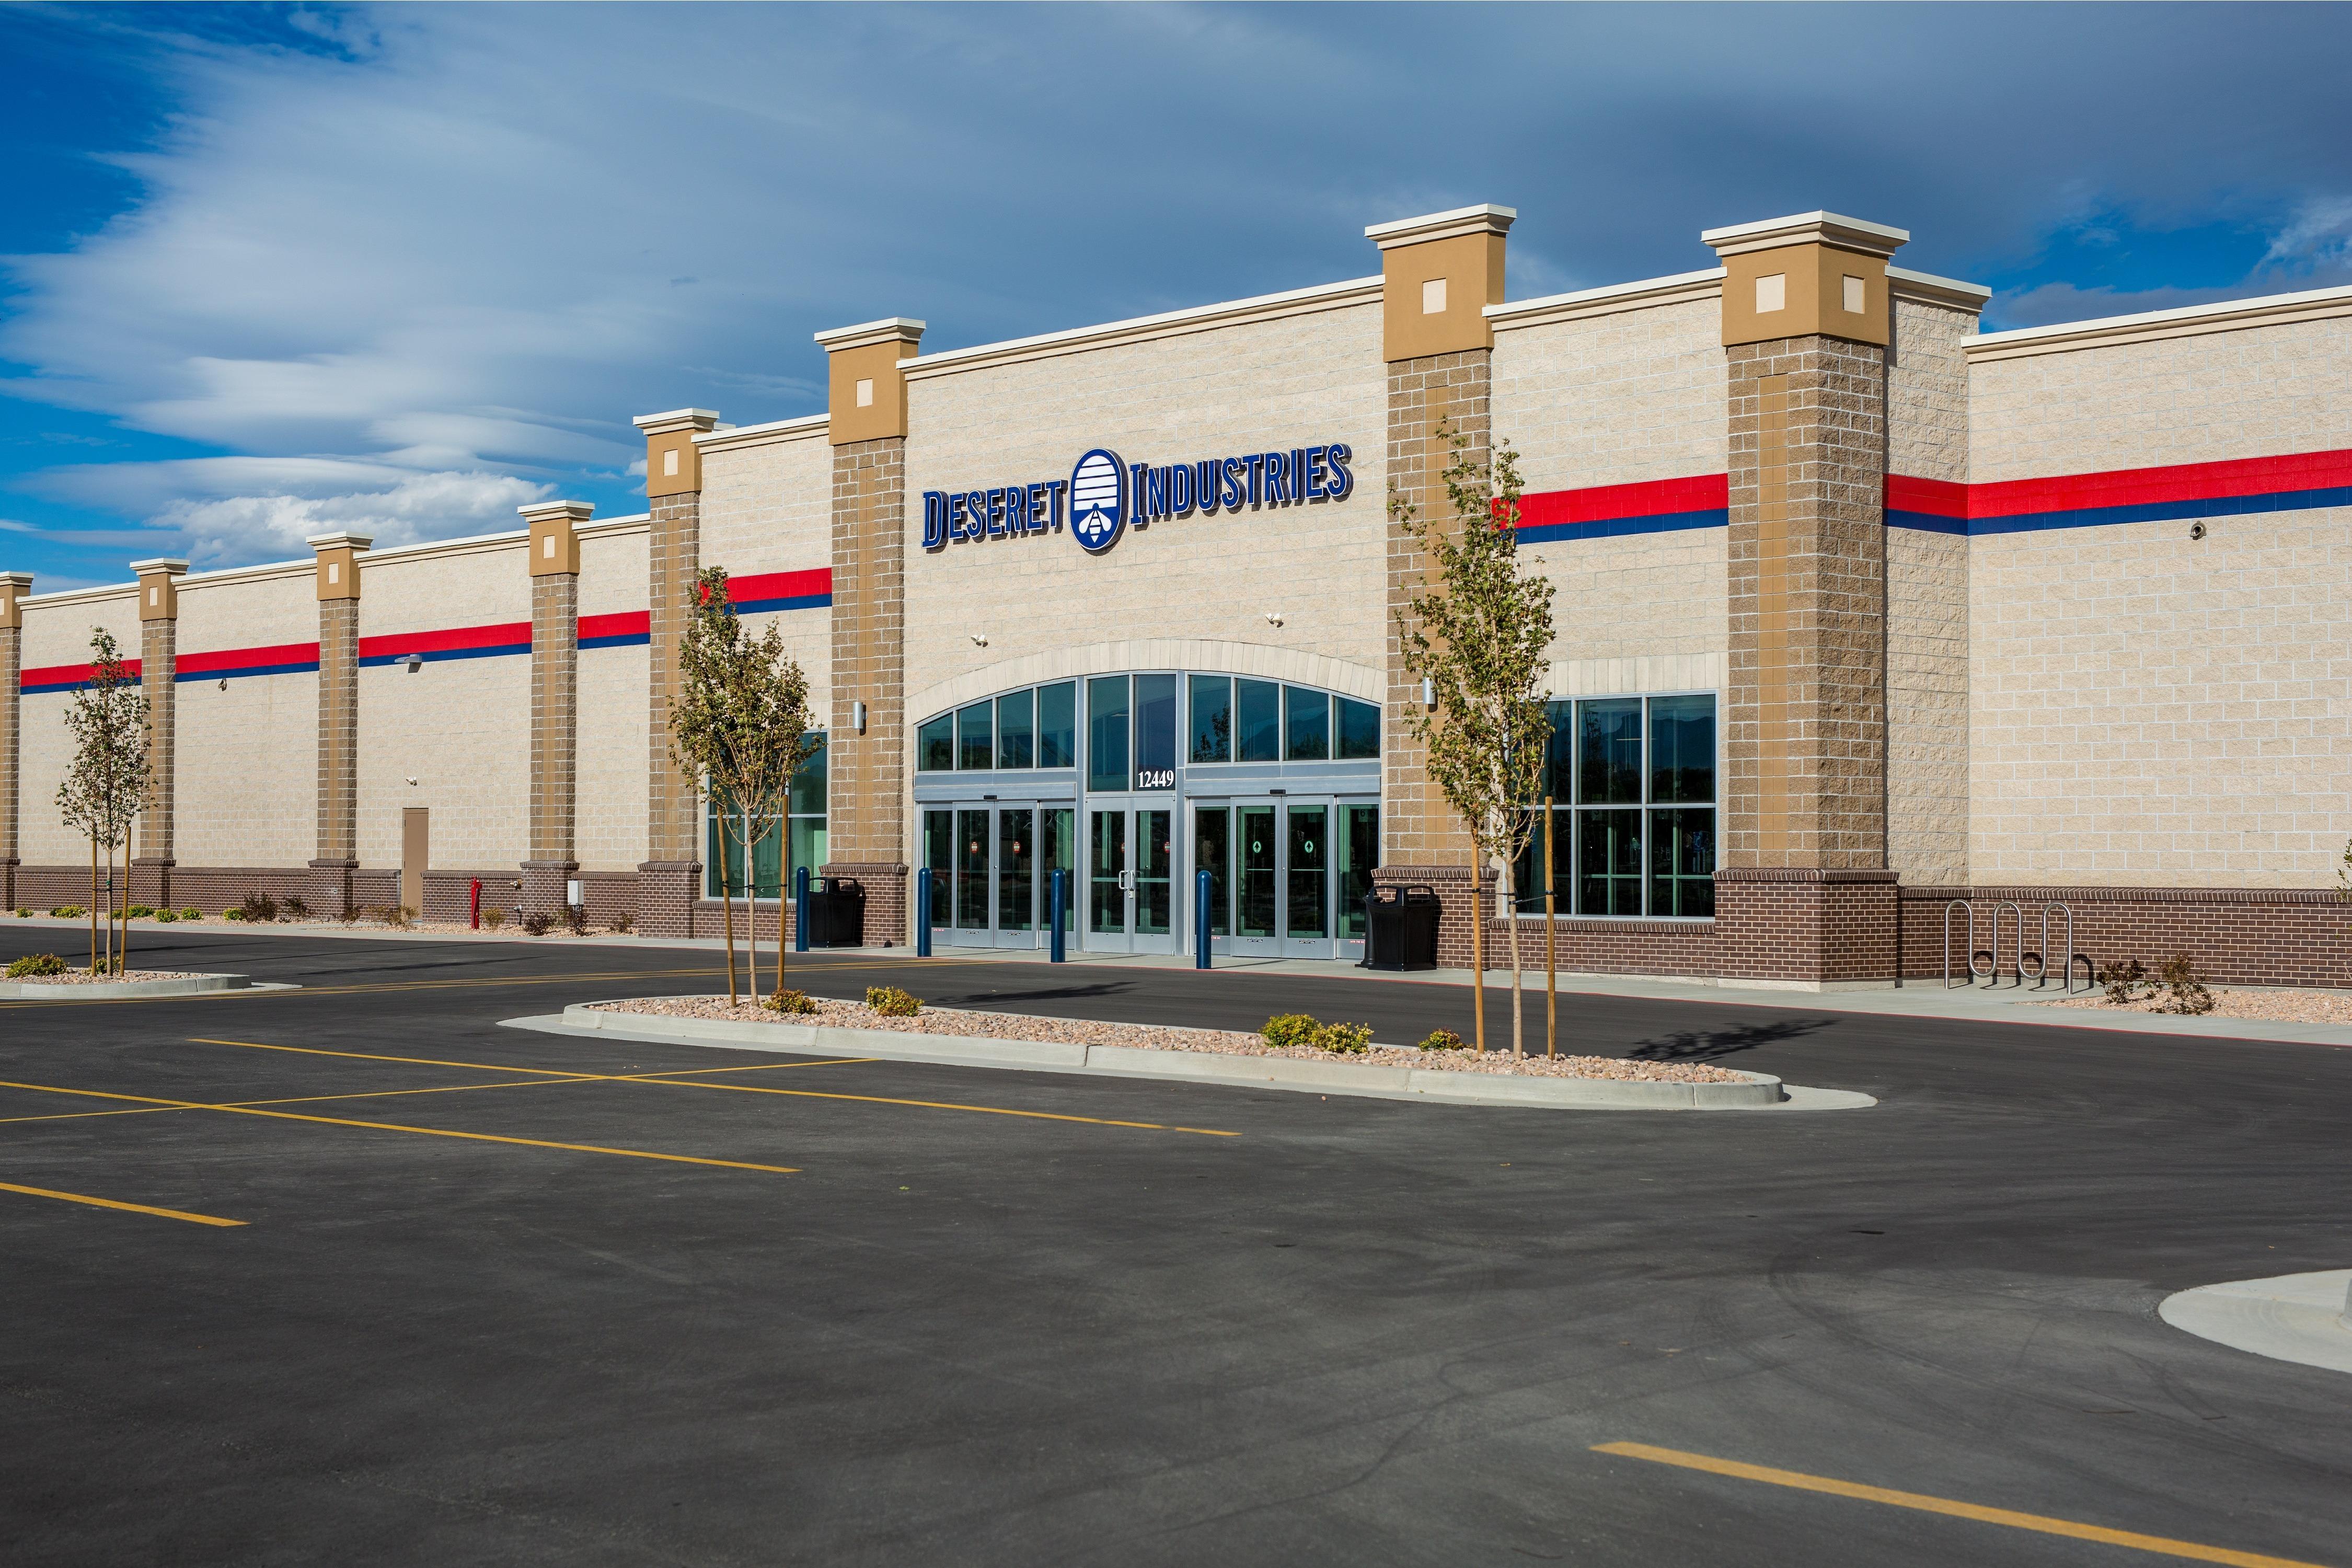 Deseret Industries Thrift Store image 0